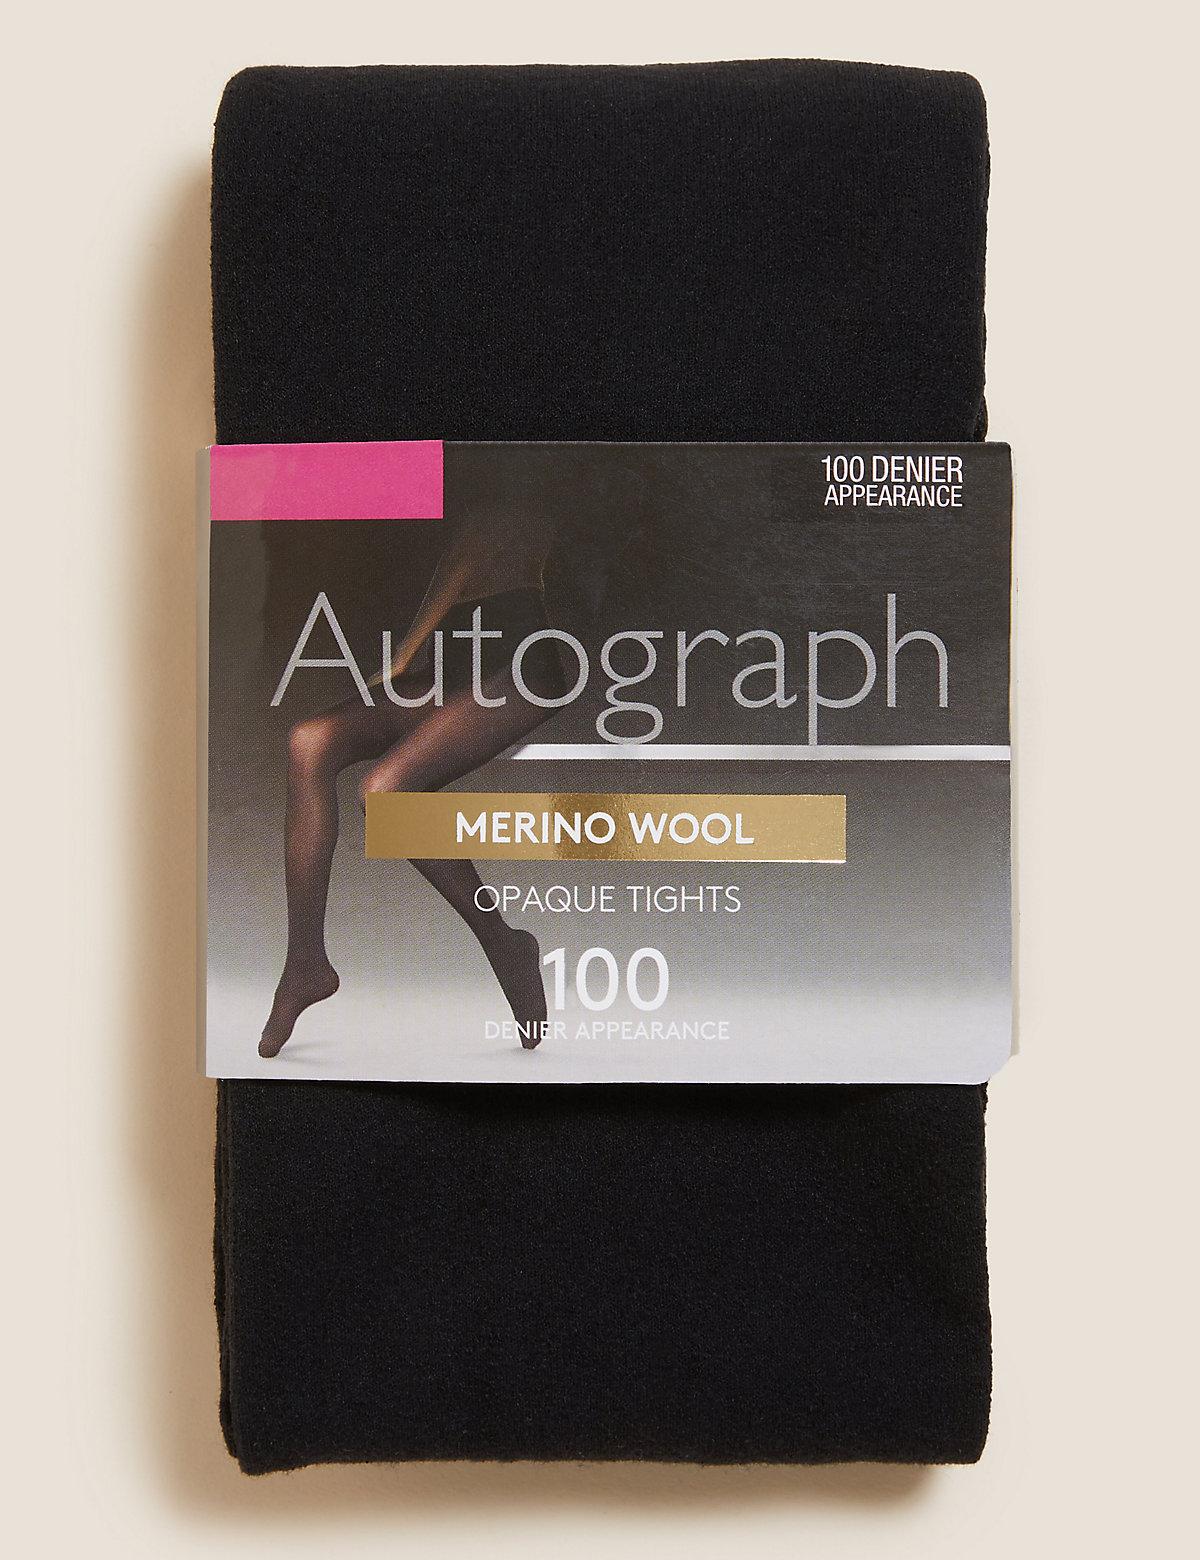 Autograph 100 Denier Merino Wool Blend Opaque Tights